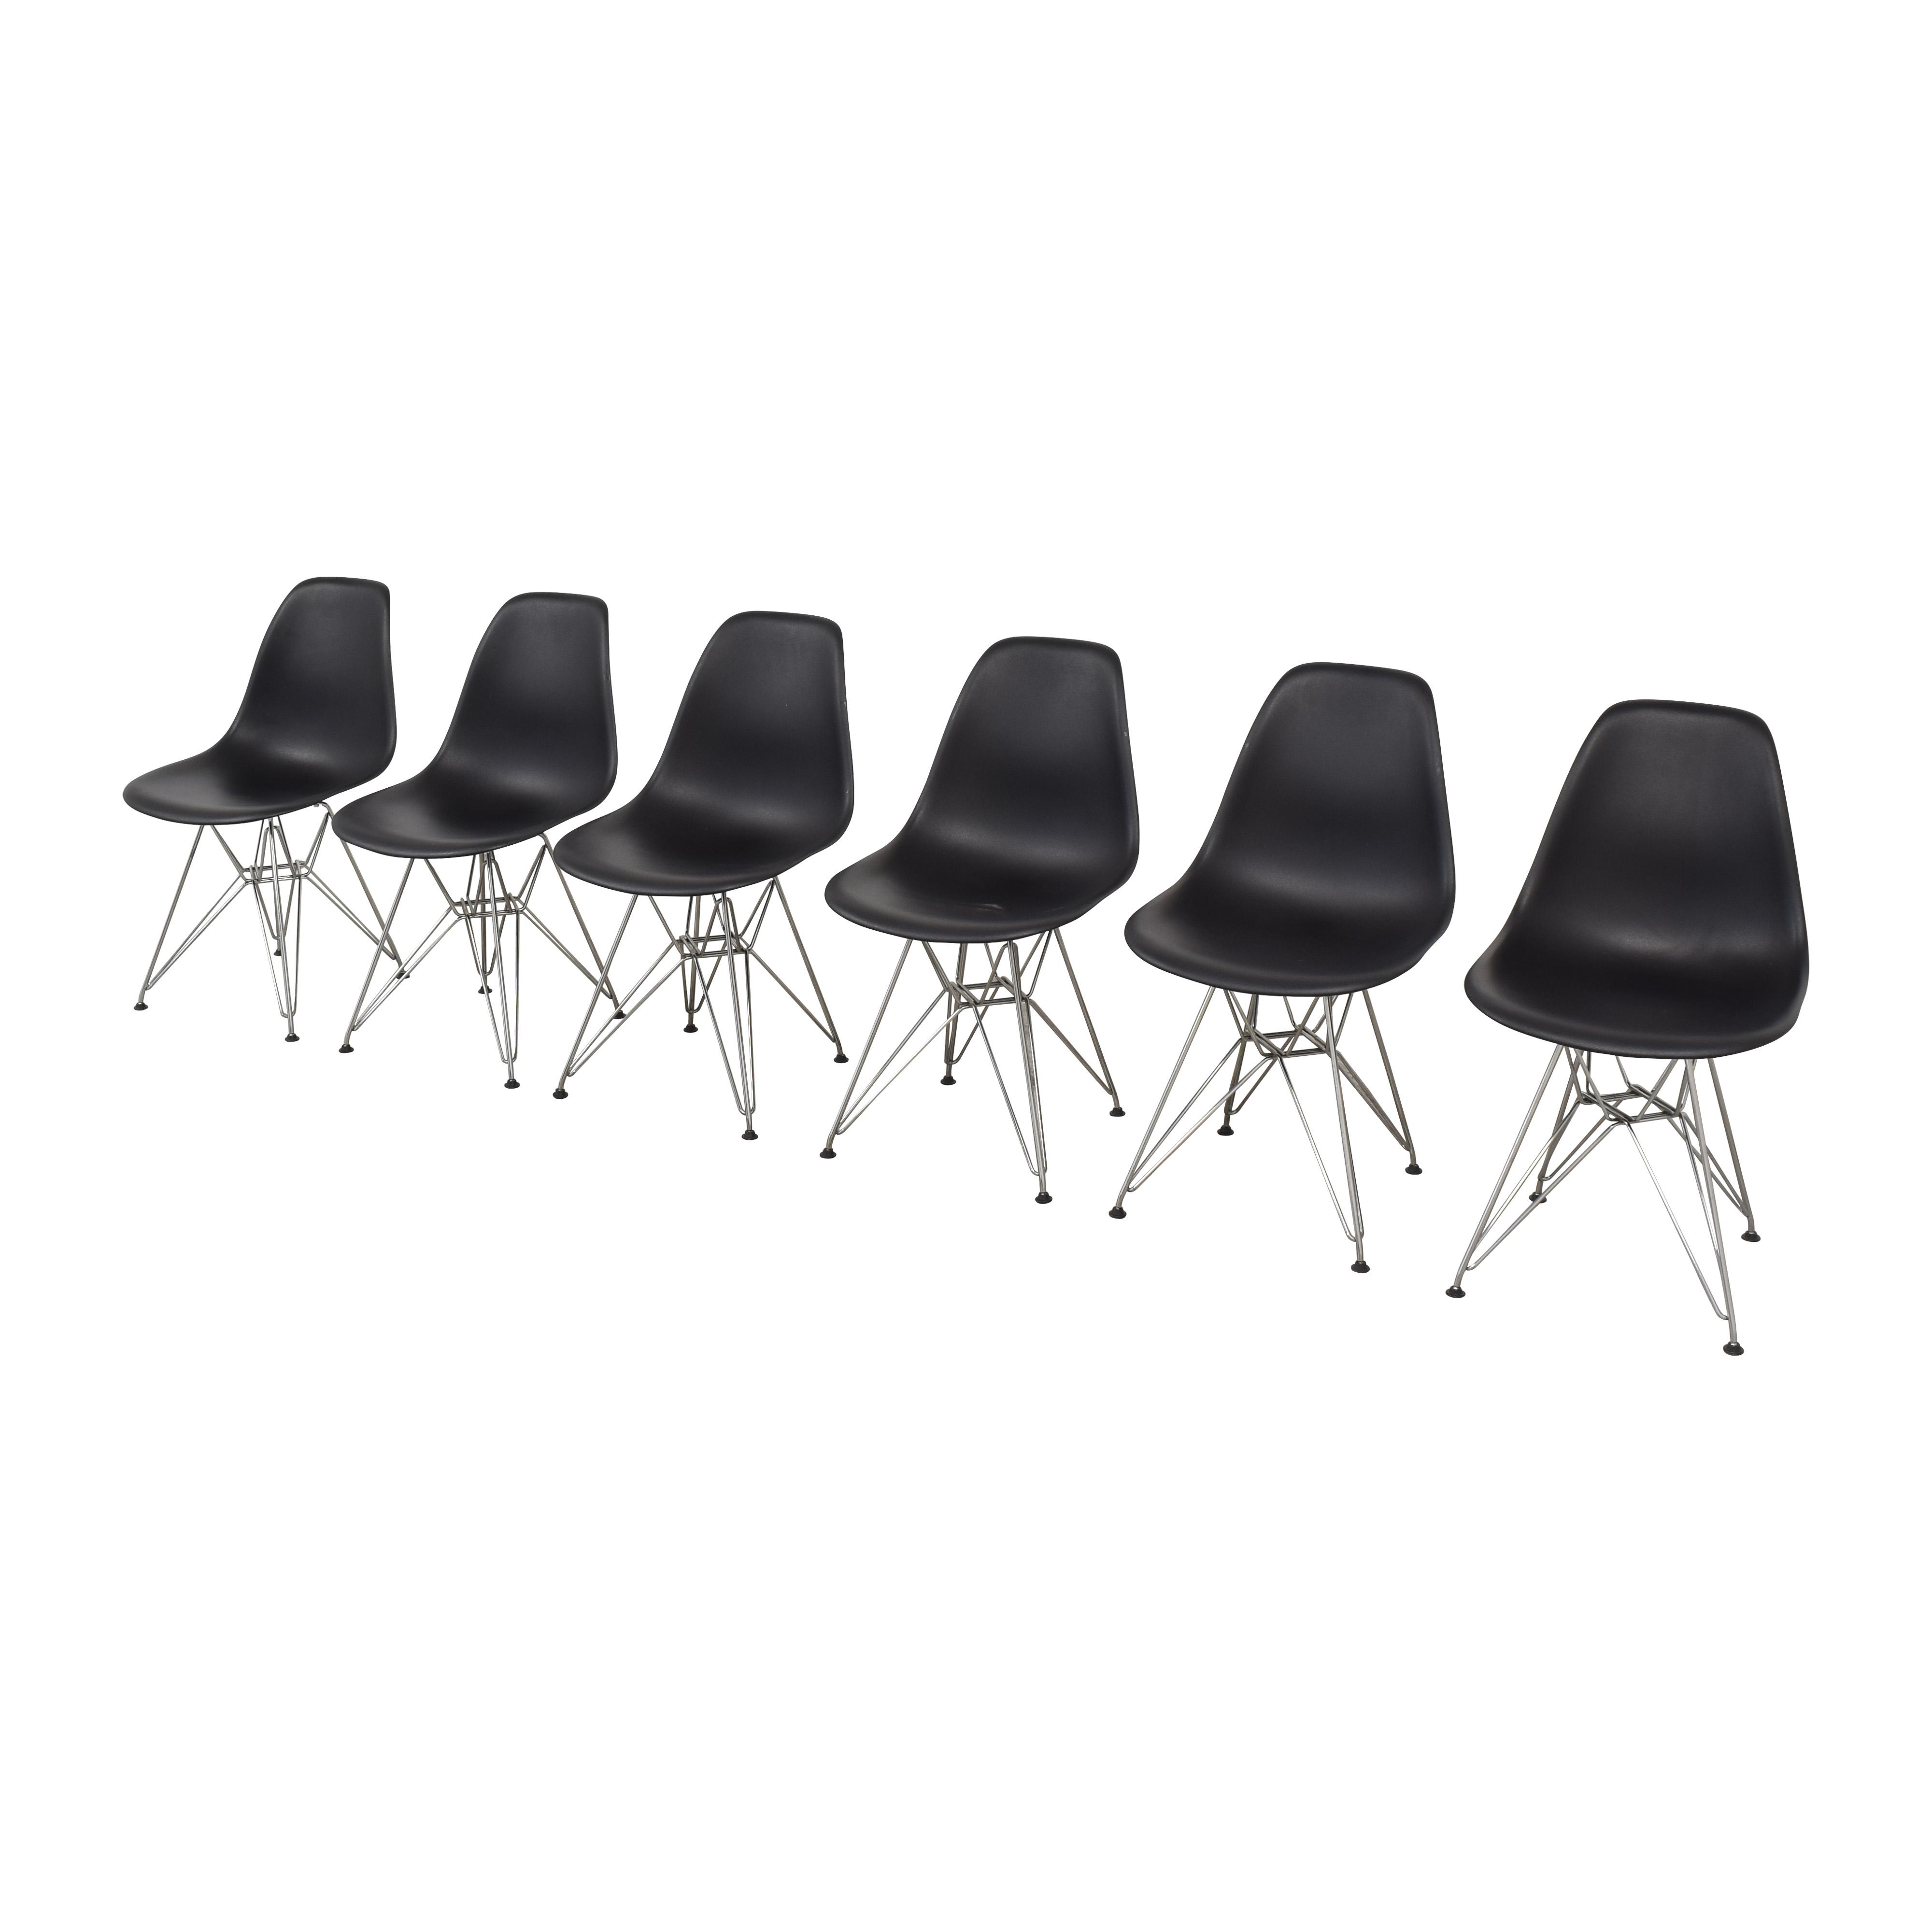 Herman Miller Herman Miller Eames Molded Plastic Wirebase Chairs discount